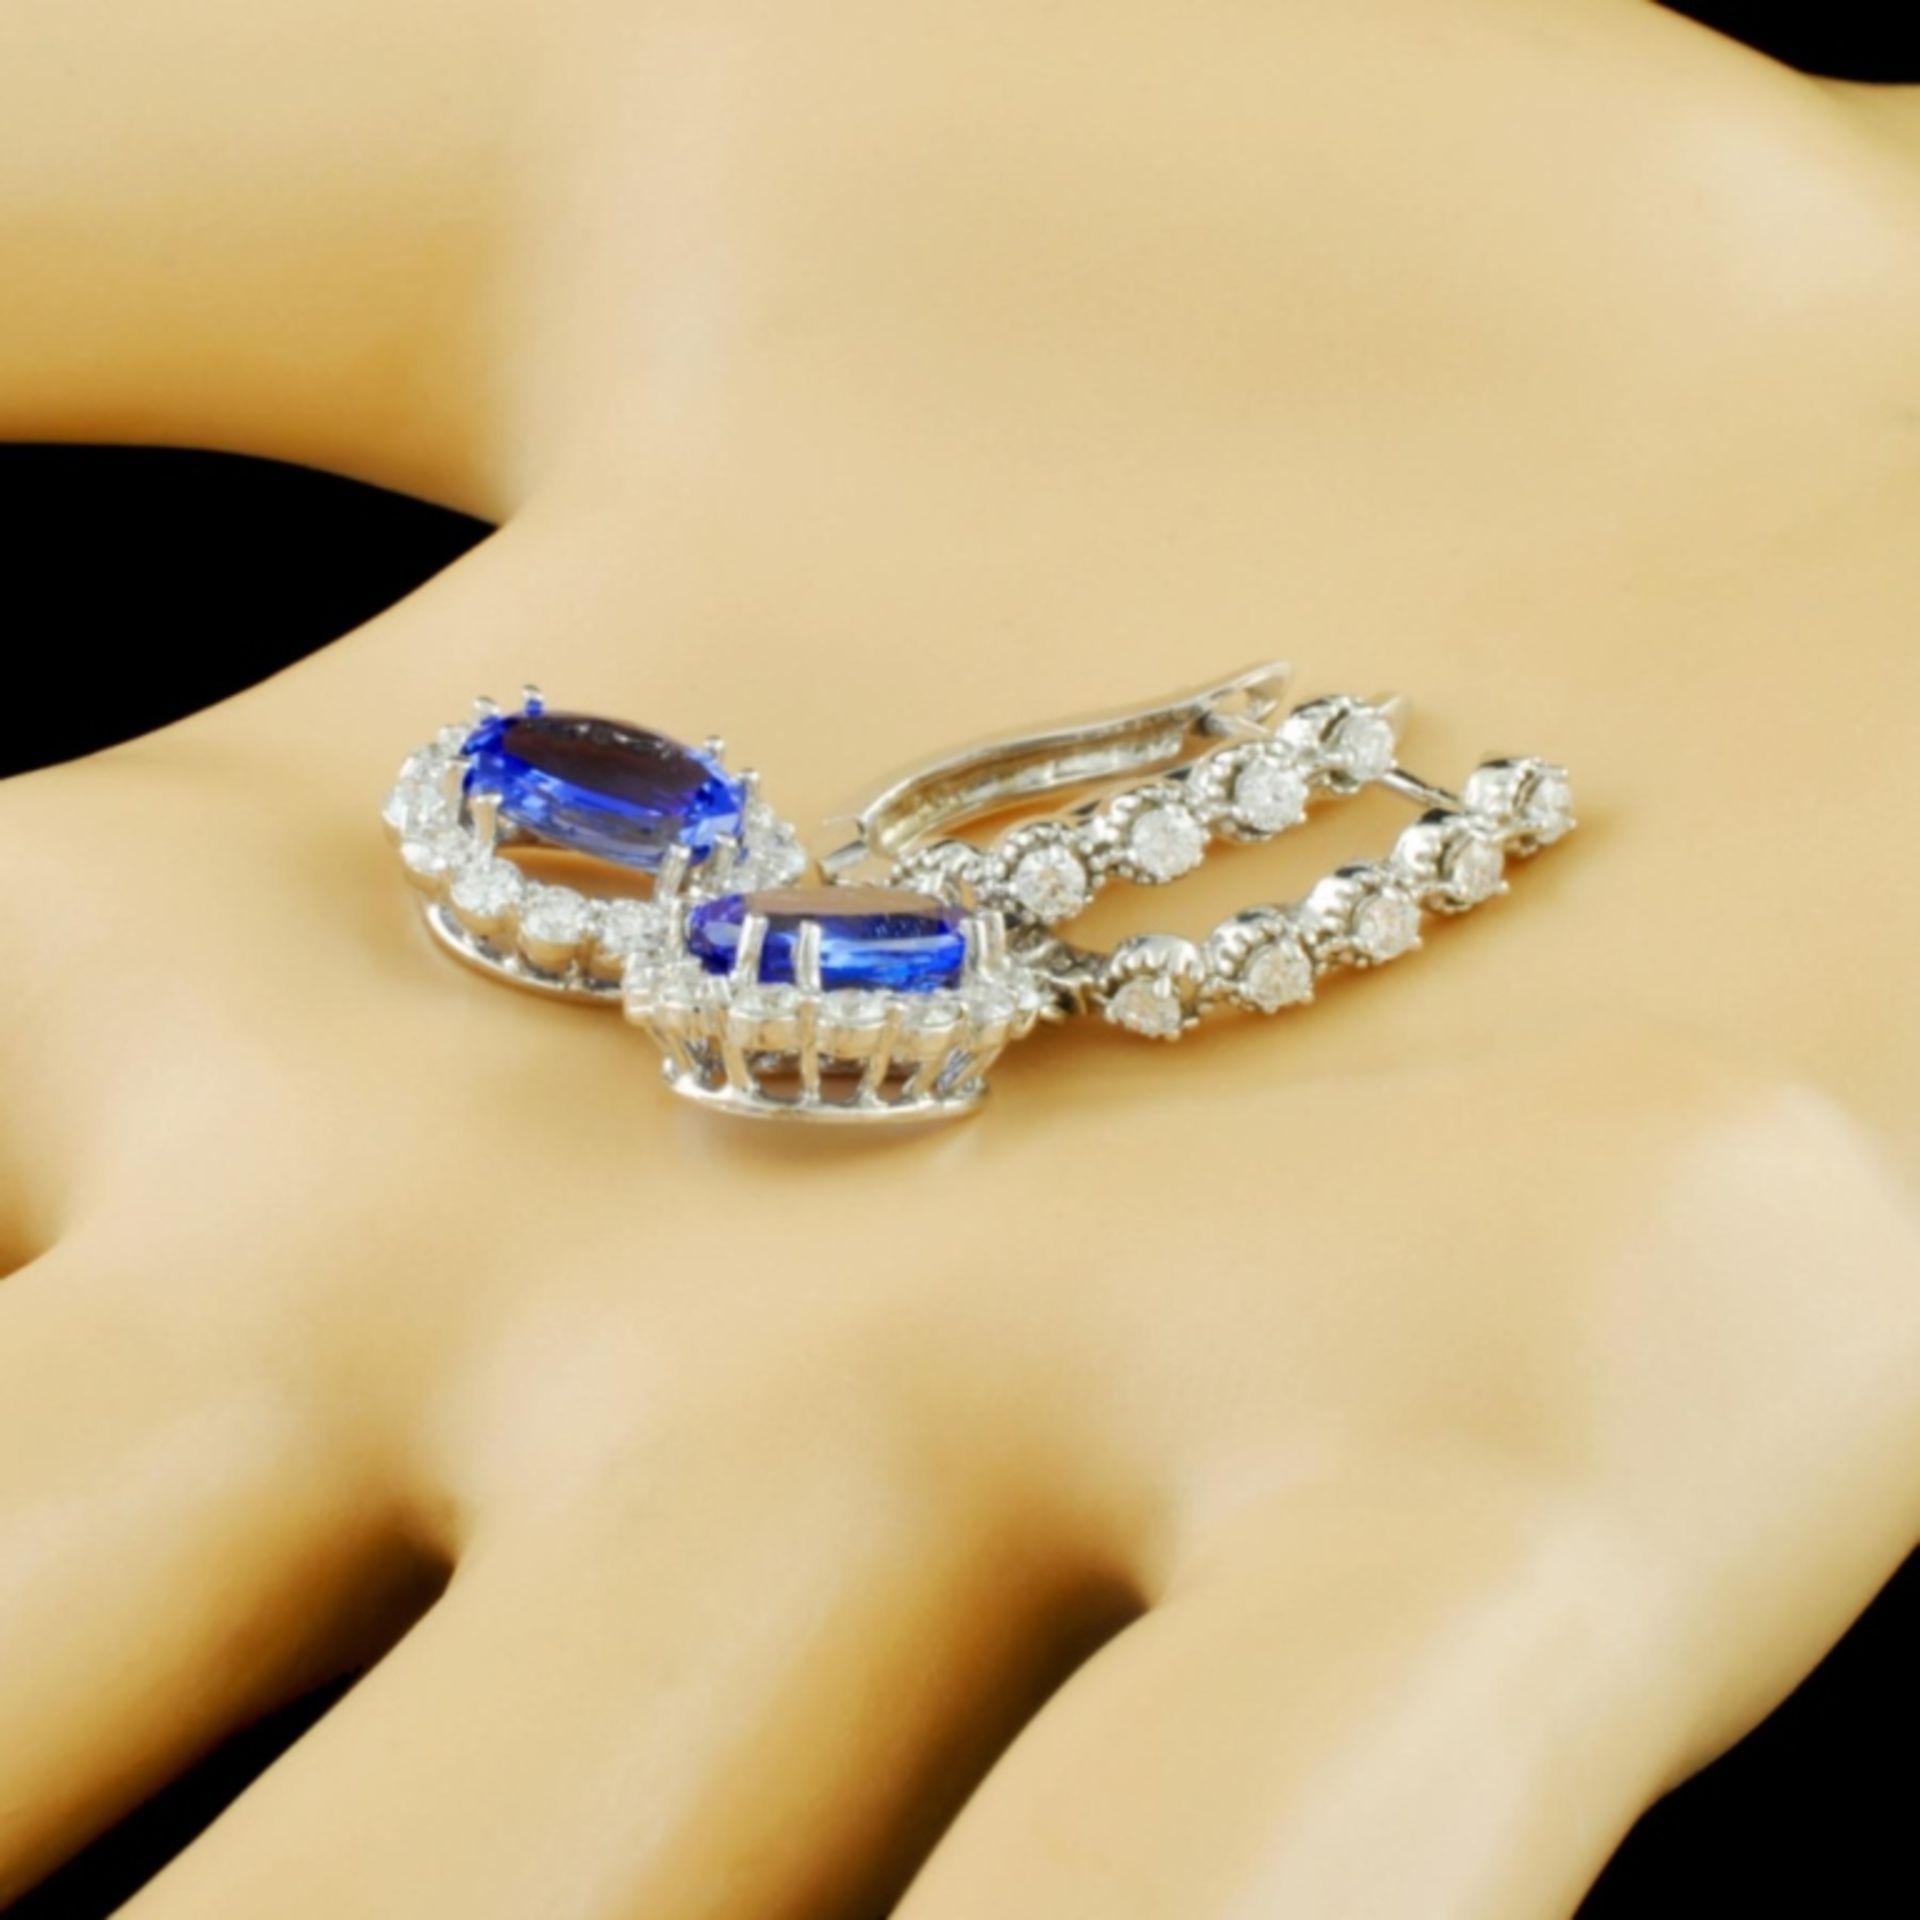 14K Gold 4.00ct Tanzanite & 1.50ctw Diamond Earrin - Image 2 of 3